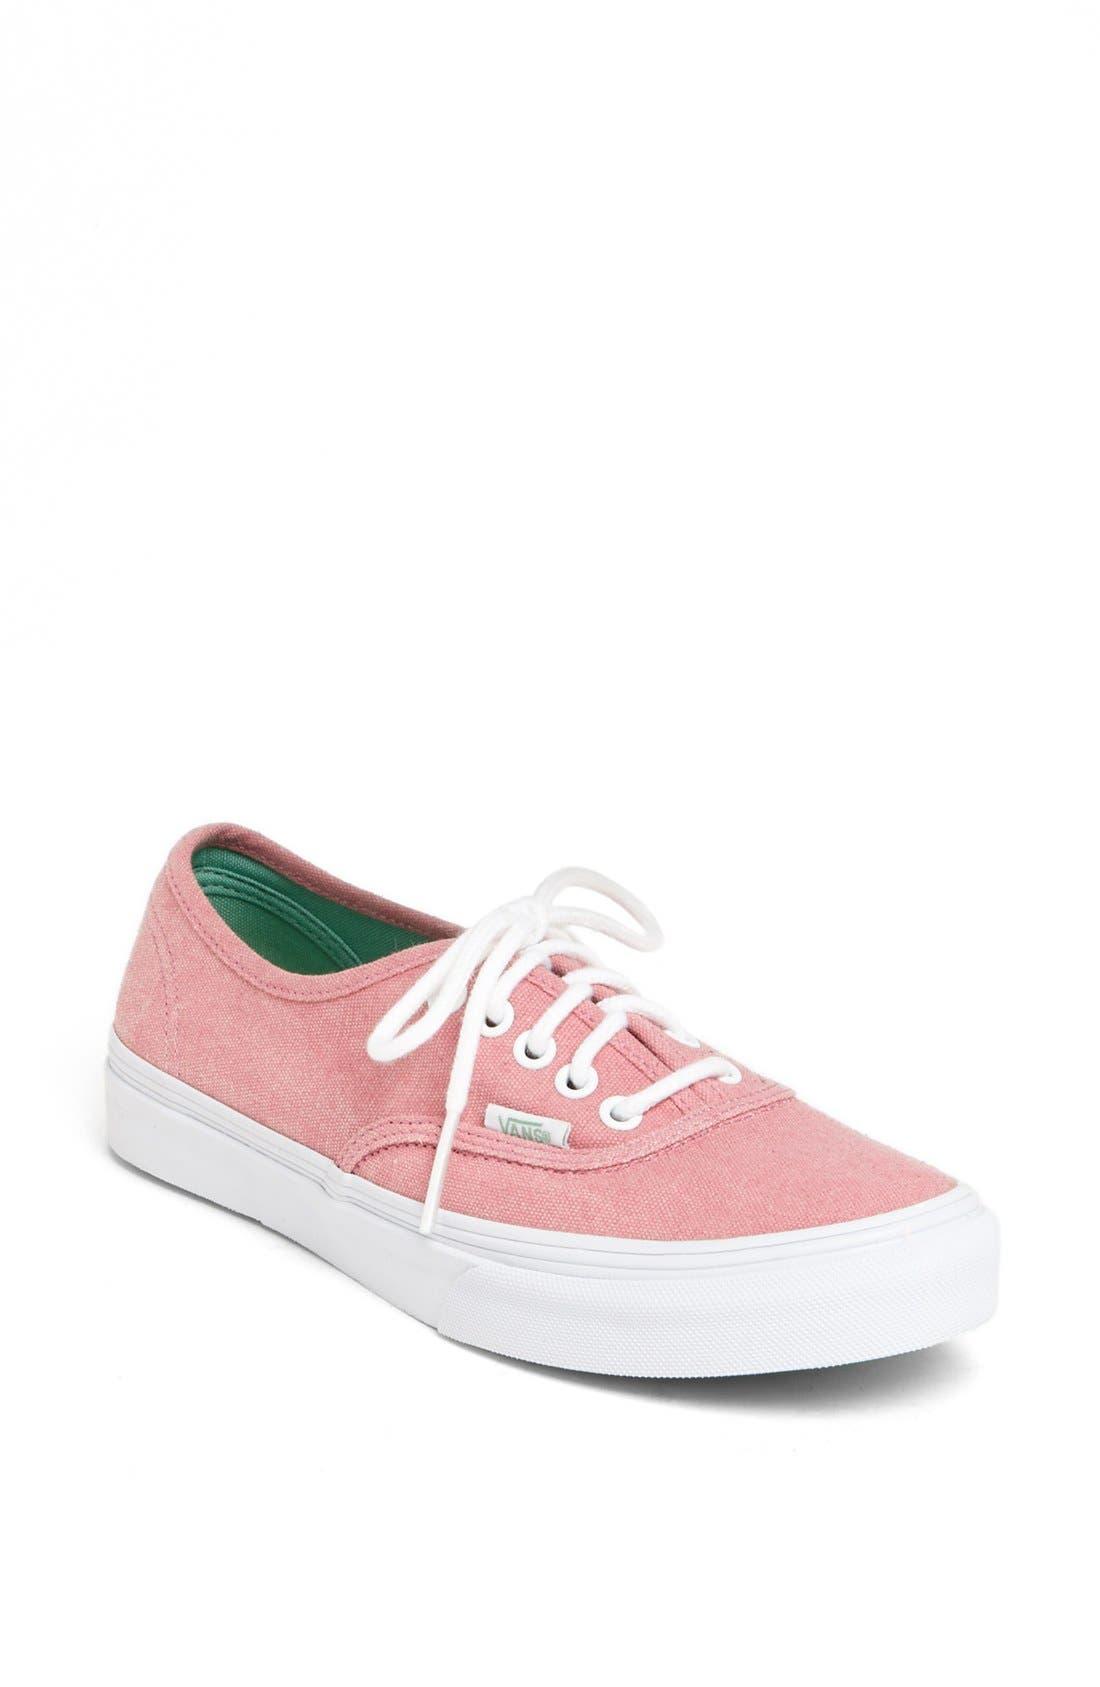 Main Image - Vans 'Authentic - Slim' Sneaker (Women)